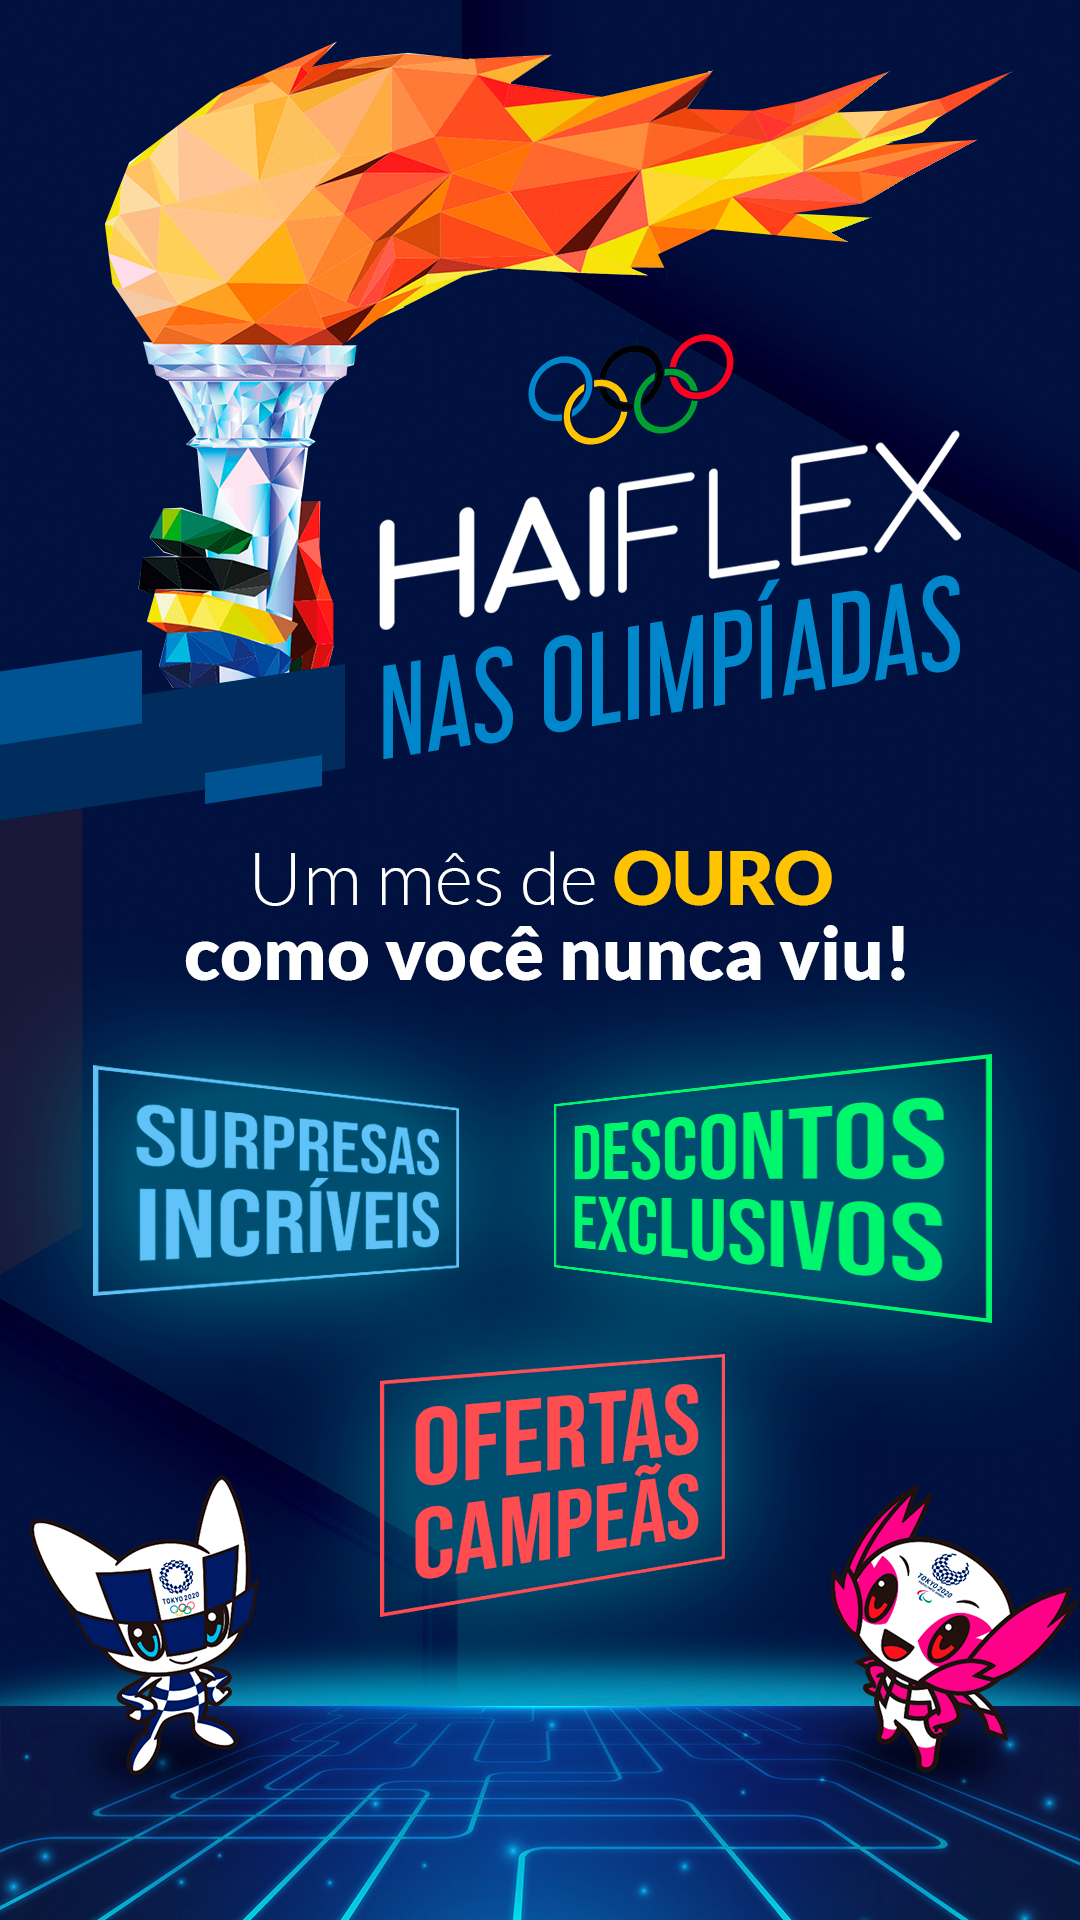 haiflex-nas-olimpiadas-v2